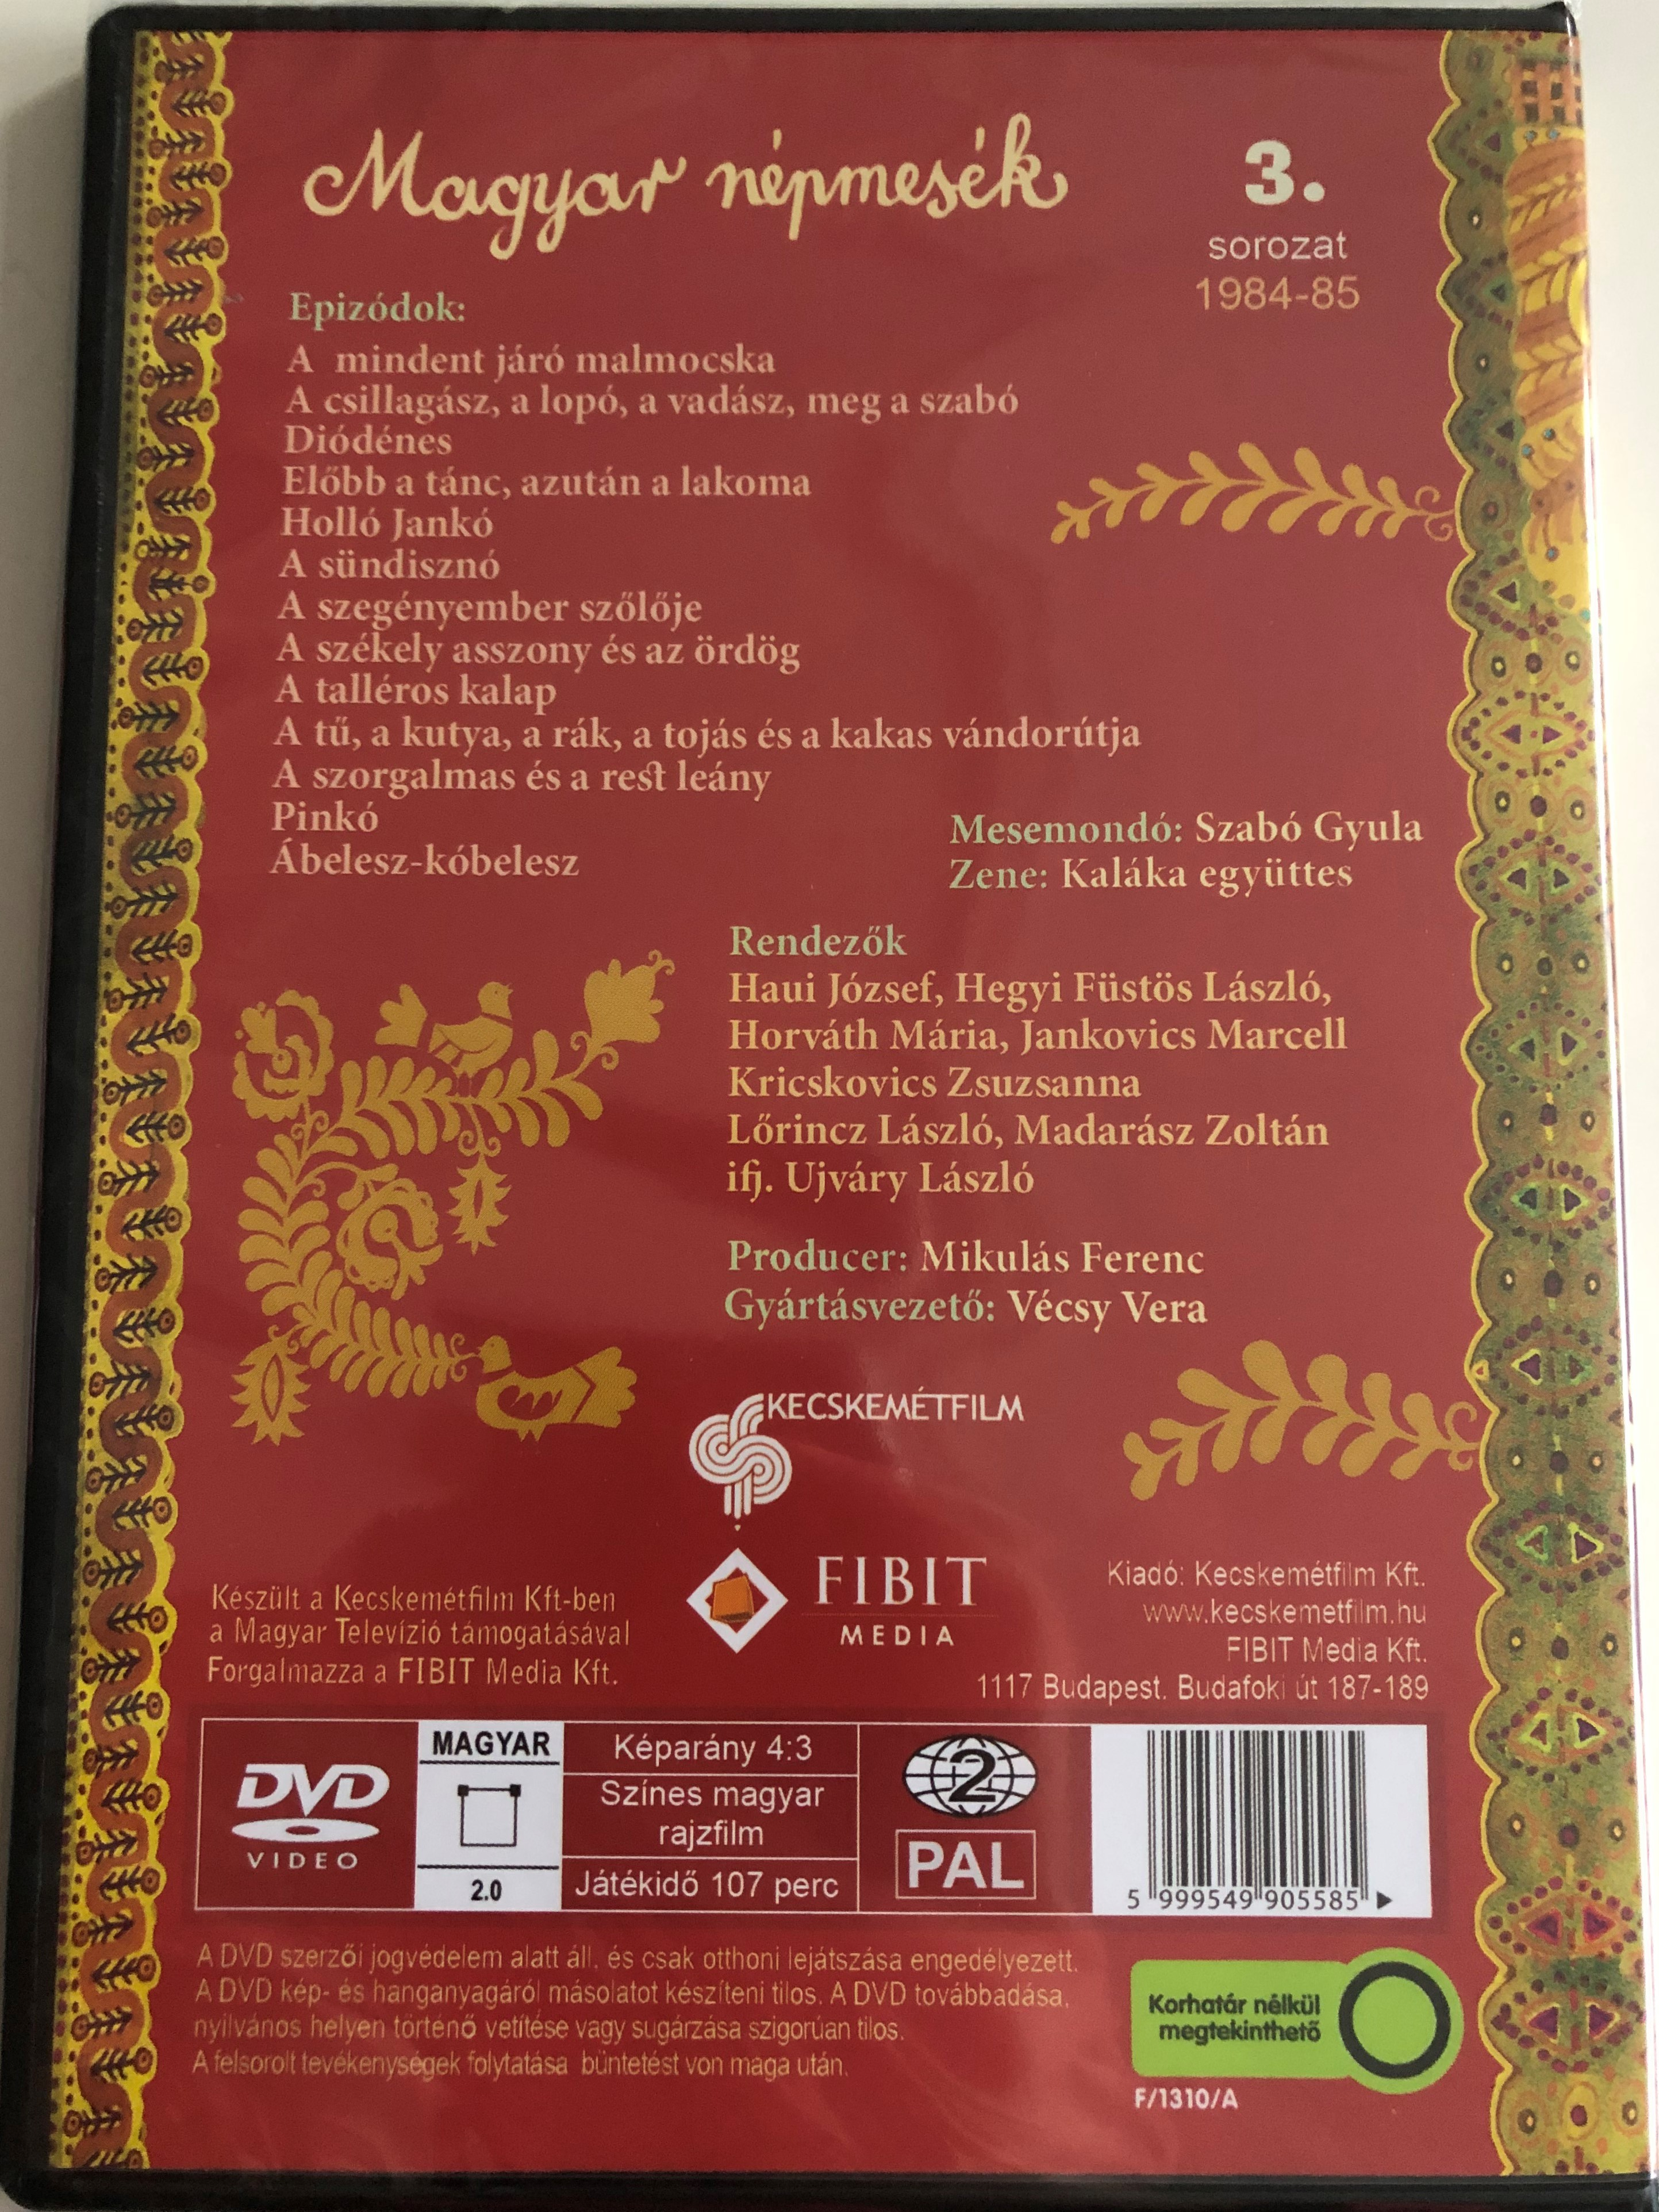 magyar-n-pmes-k-3.-a-mindent-j-r-malmocska-dvd-1984-1985-hungarian-folk-tales-for-children-directed-by-jankovics-marcell-haui-j-zsef-2-.jpg